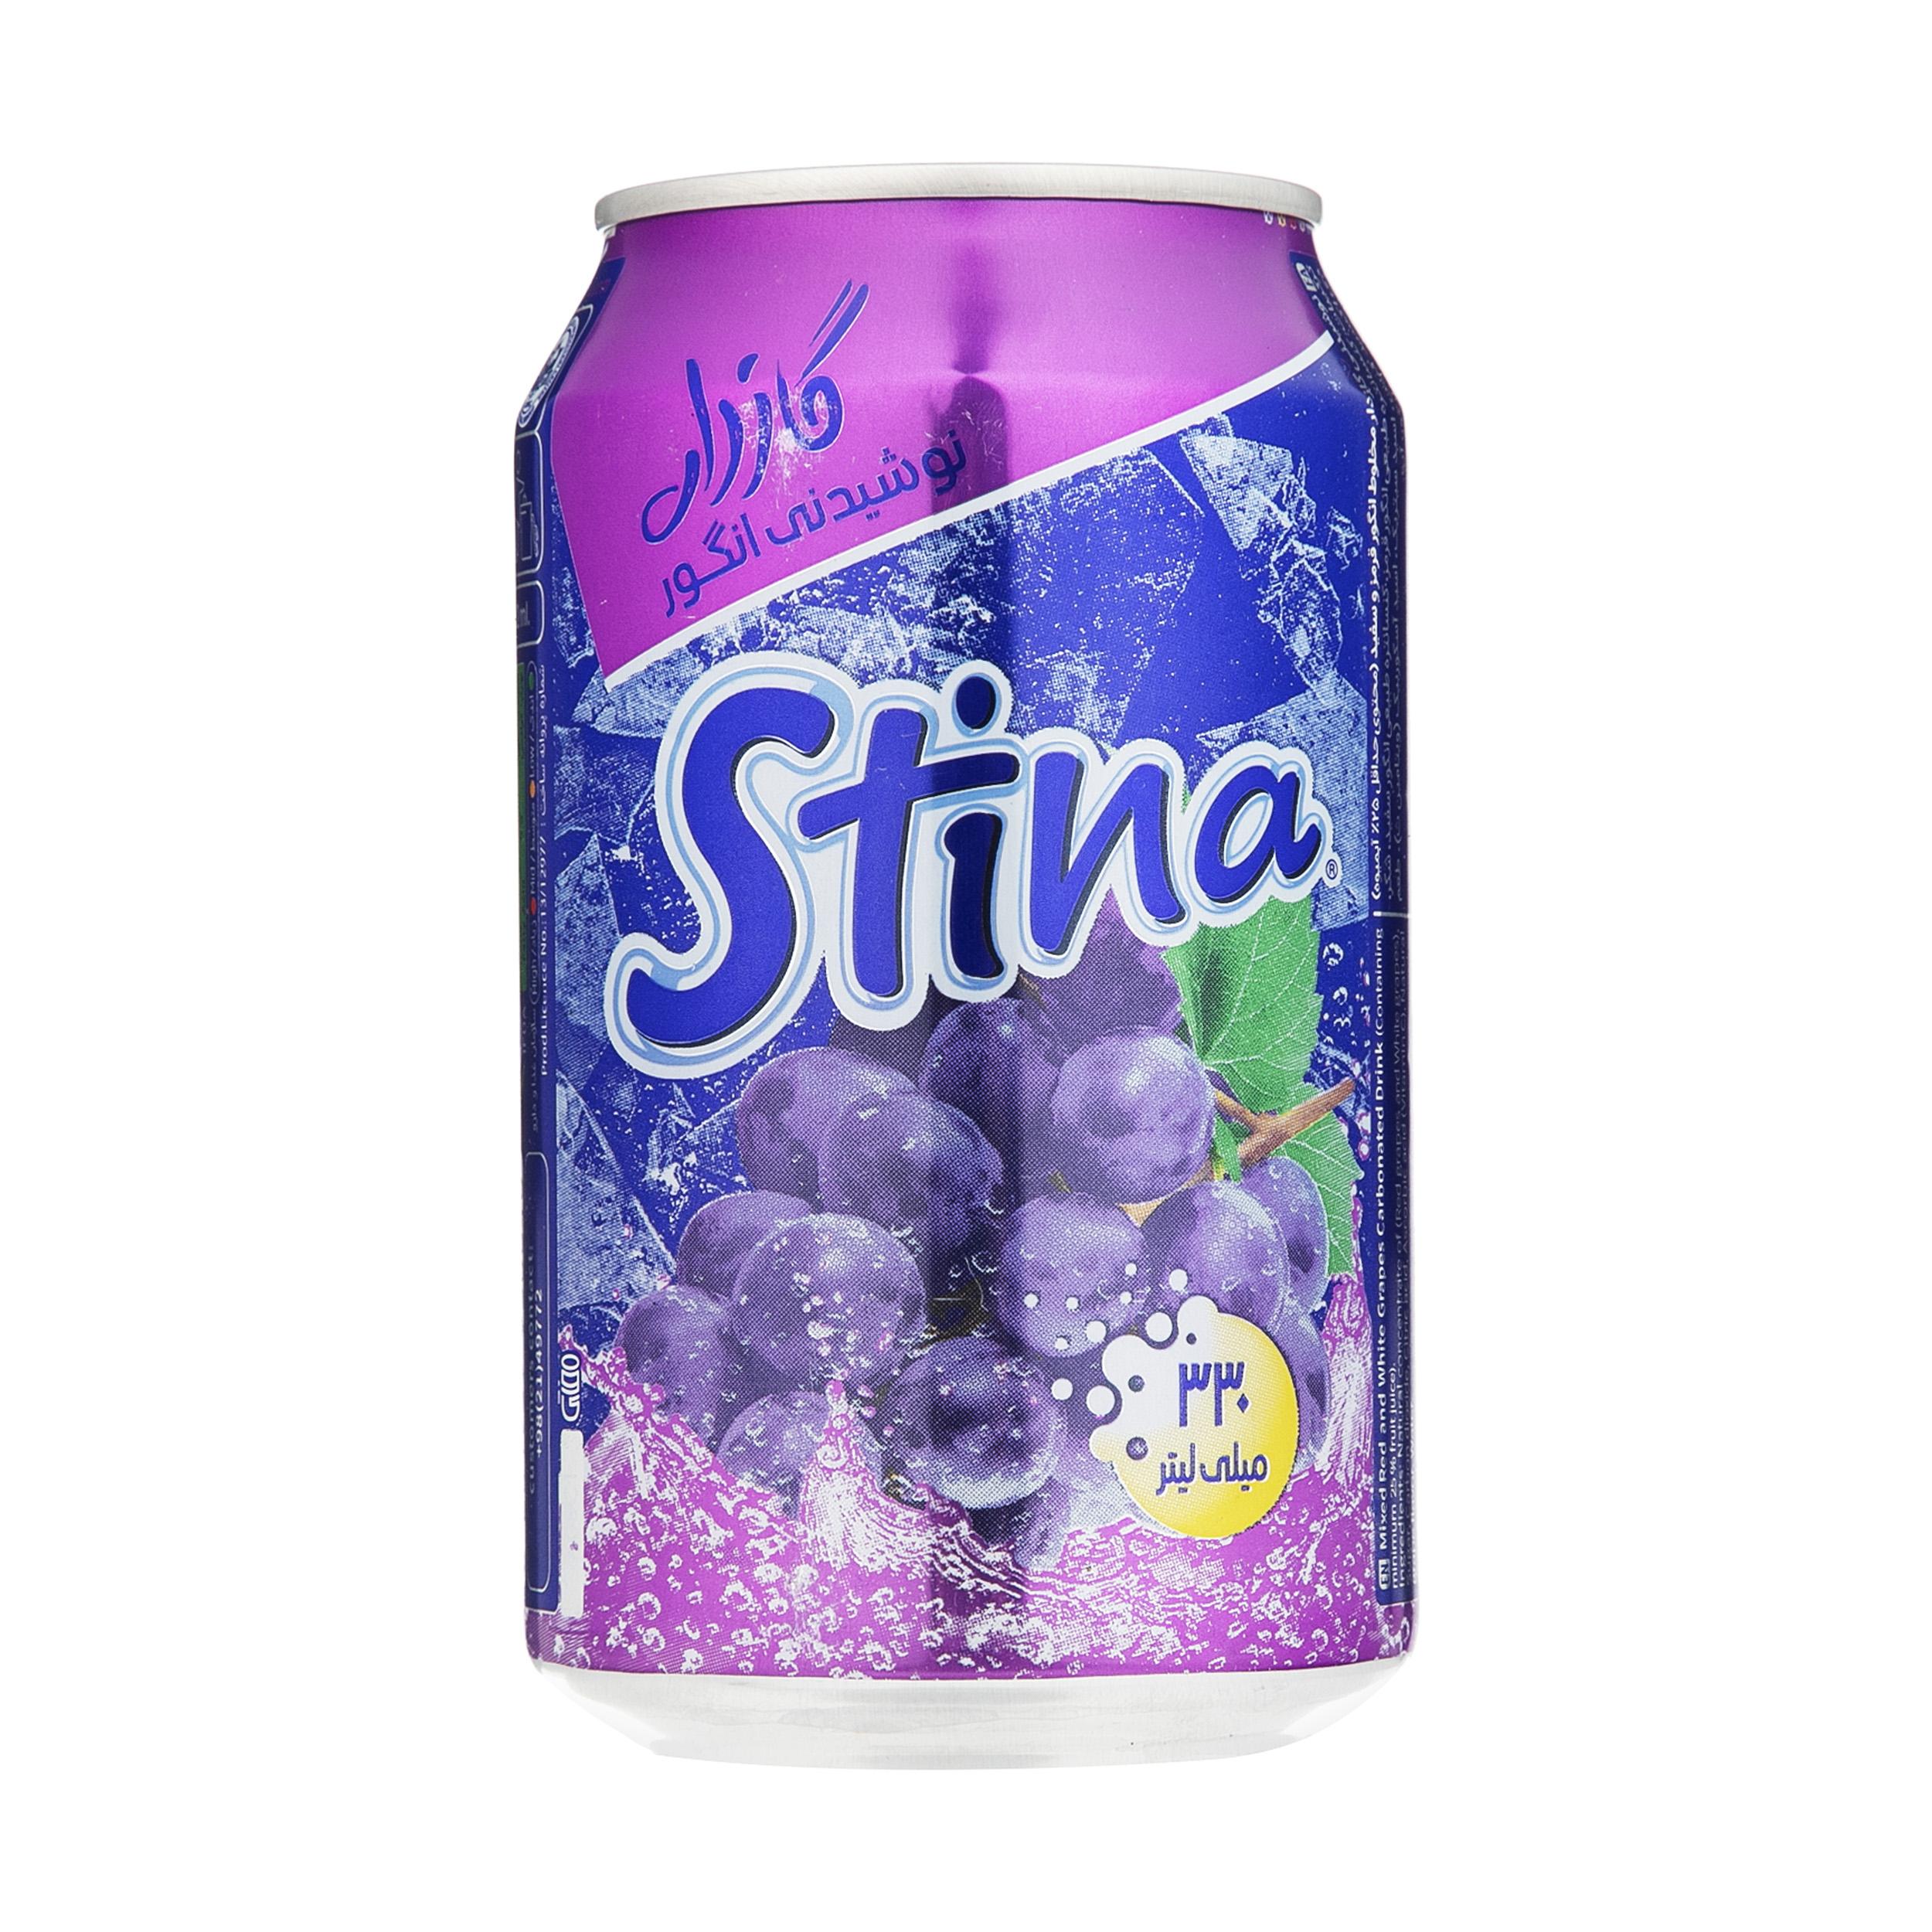 نوشیدنی گازدار انگور استینا - 330 میلی لیتر